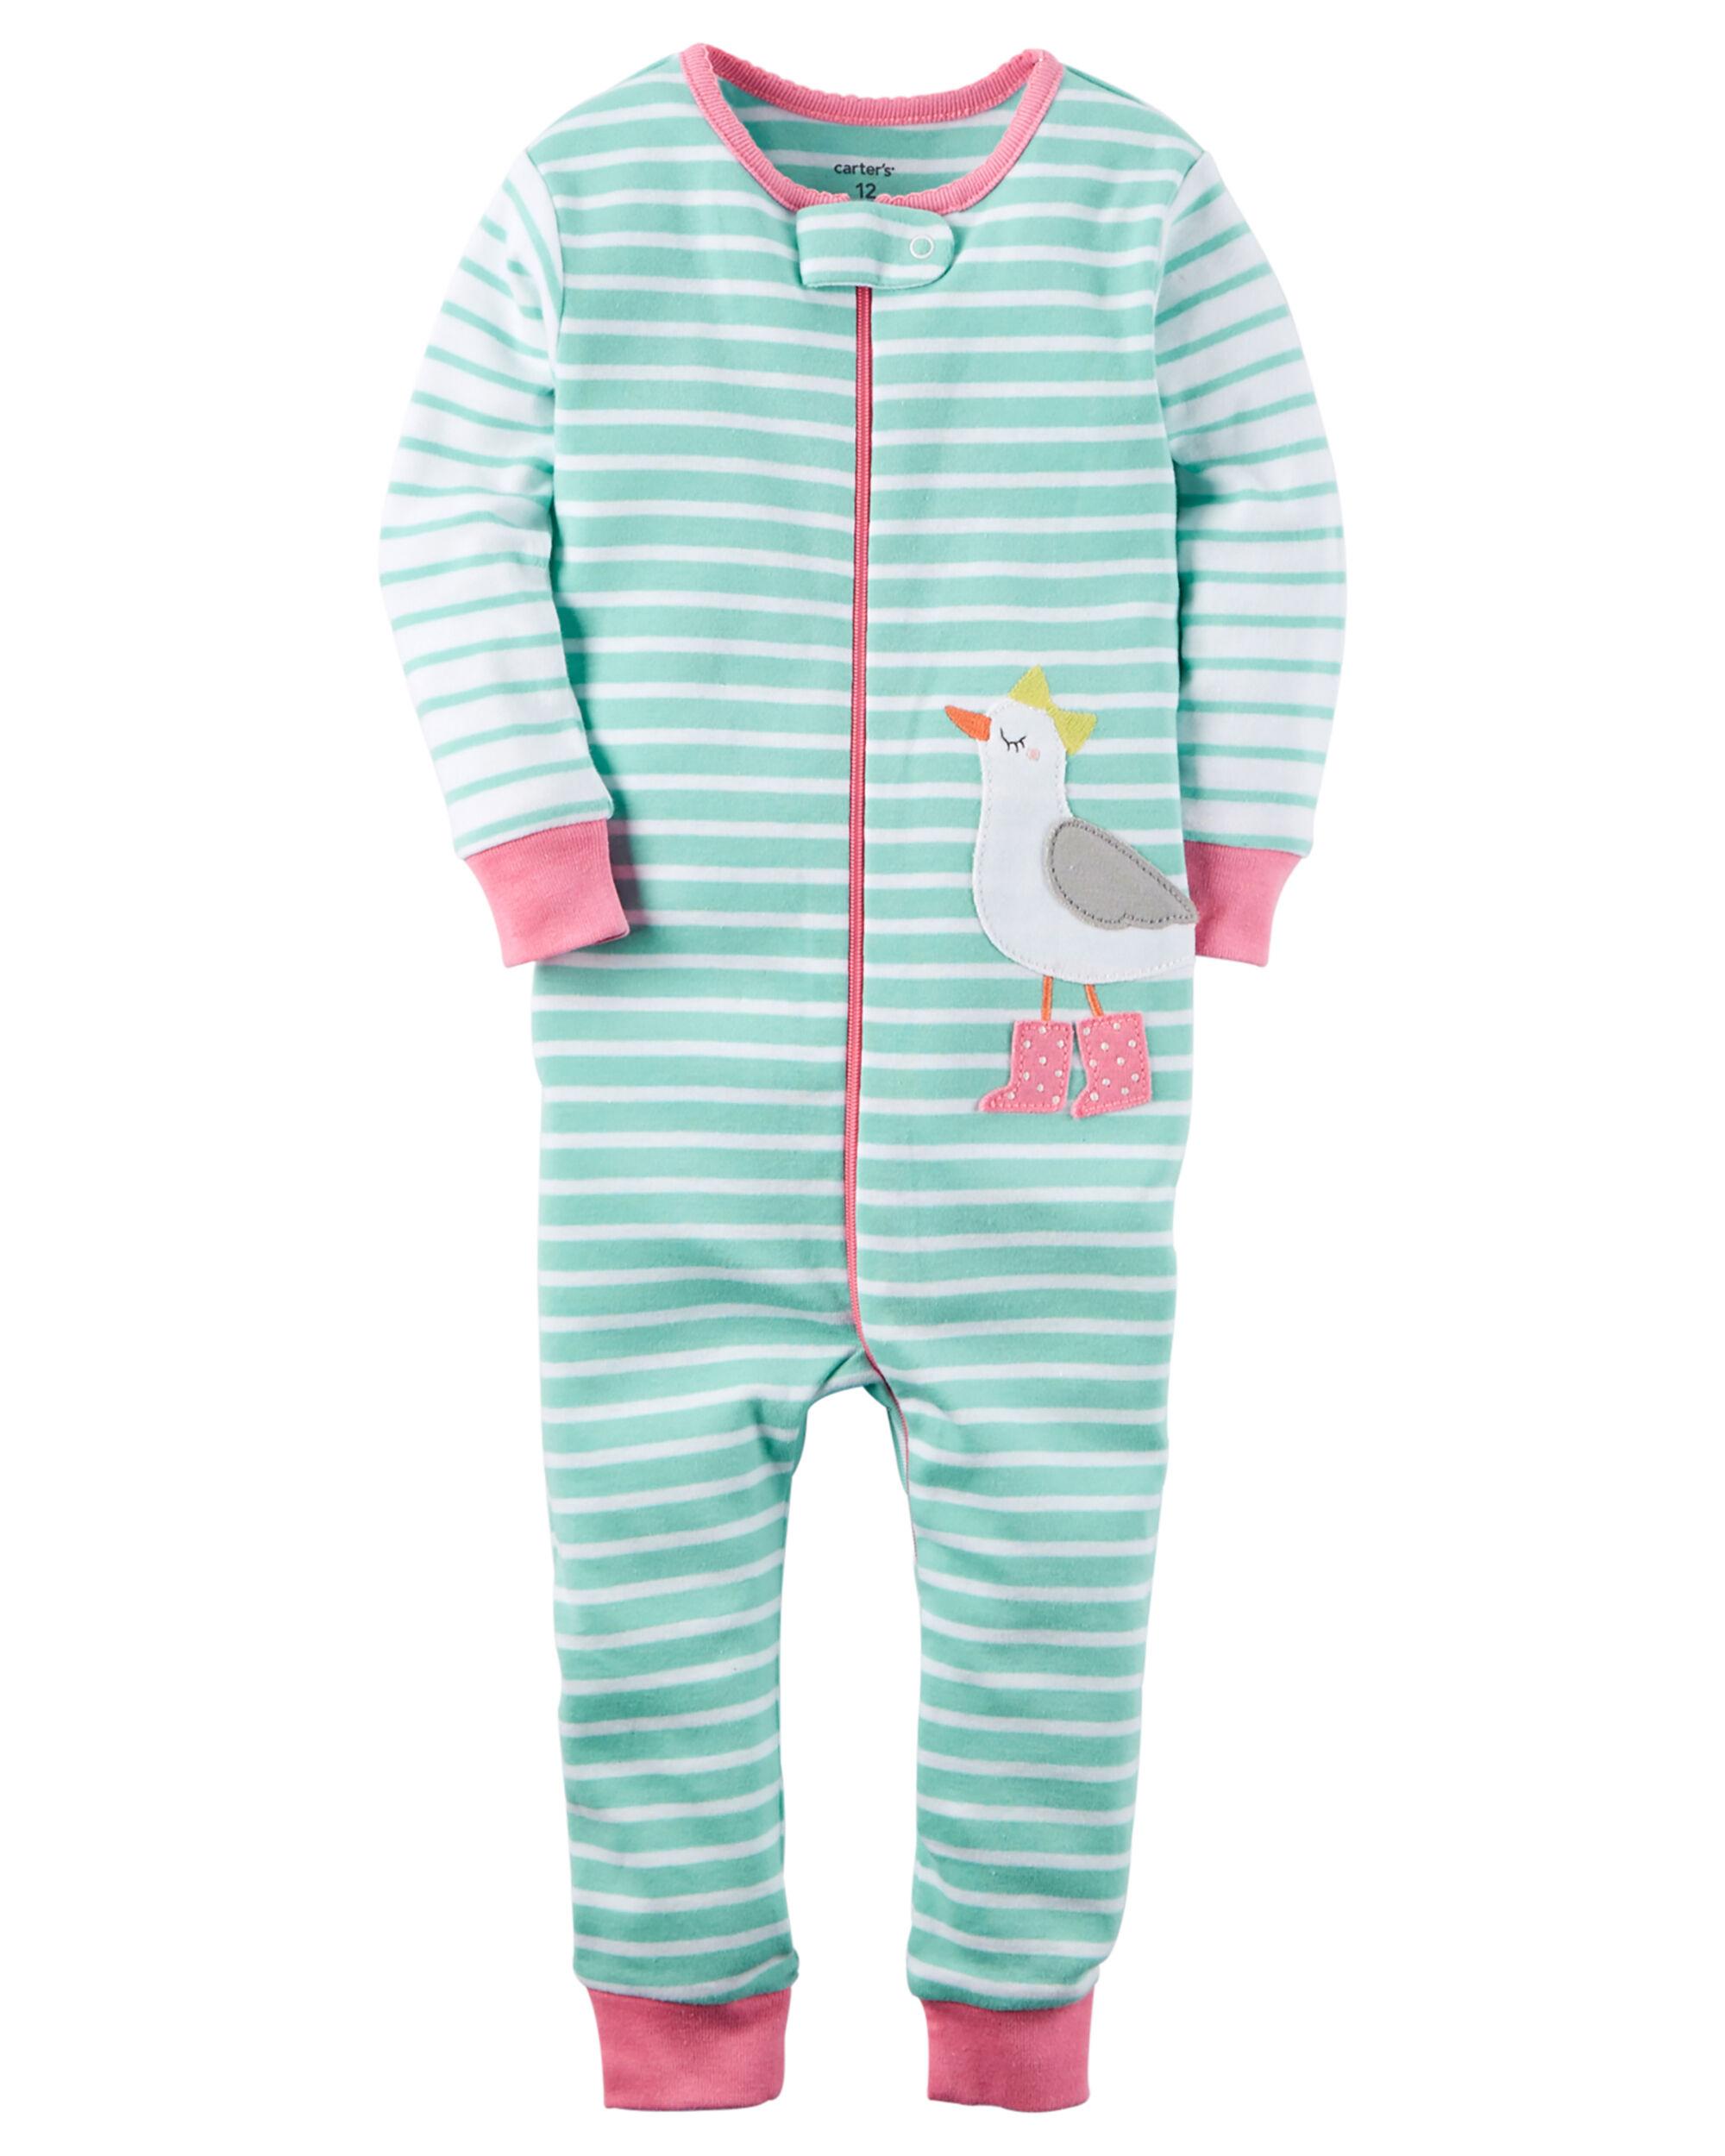 pj comfortable sleeve tranquille womens women most s pajamas pajama trending by set comforter viscose texeresilk gt bamboo long